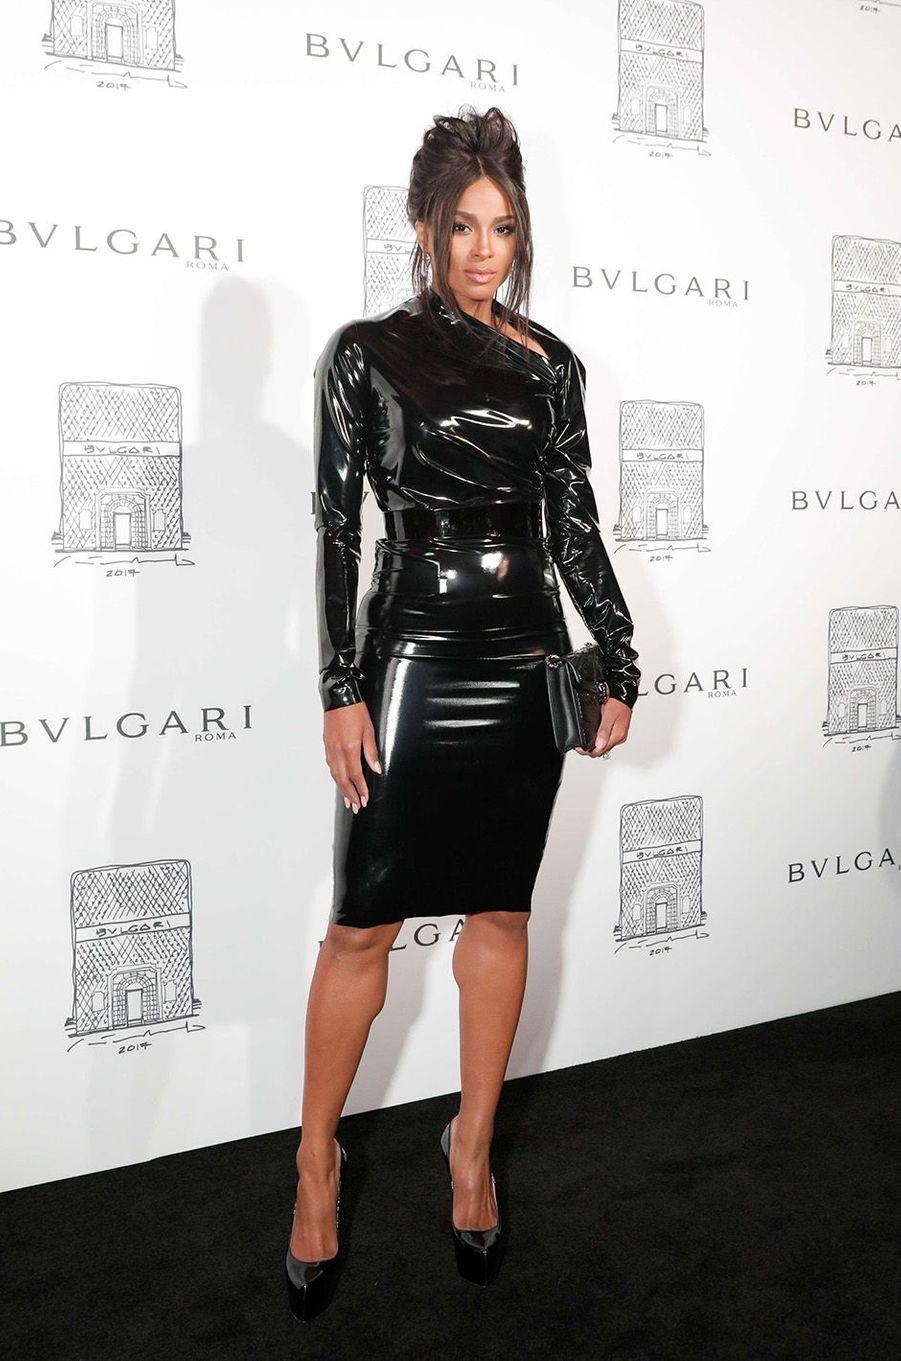 Ciara lors de l'inauguration de la nouvelle boutique Bulgari à New York, le 20 octobre 2017.